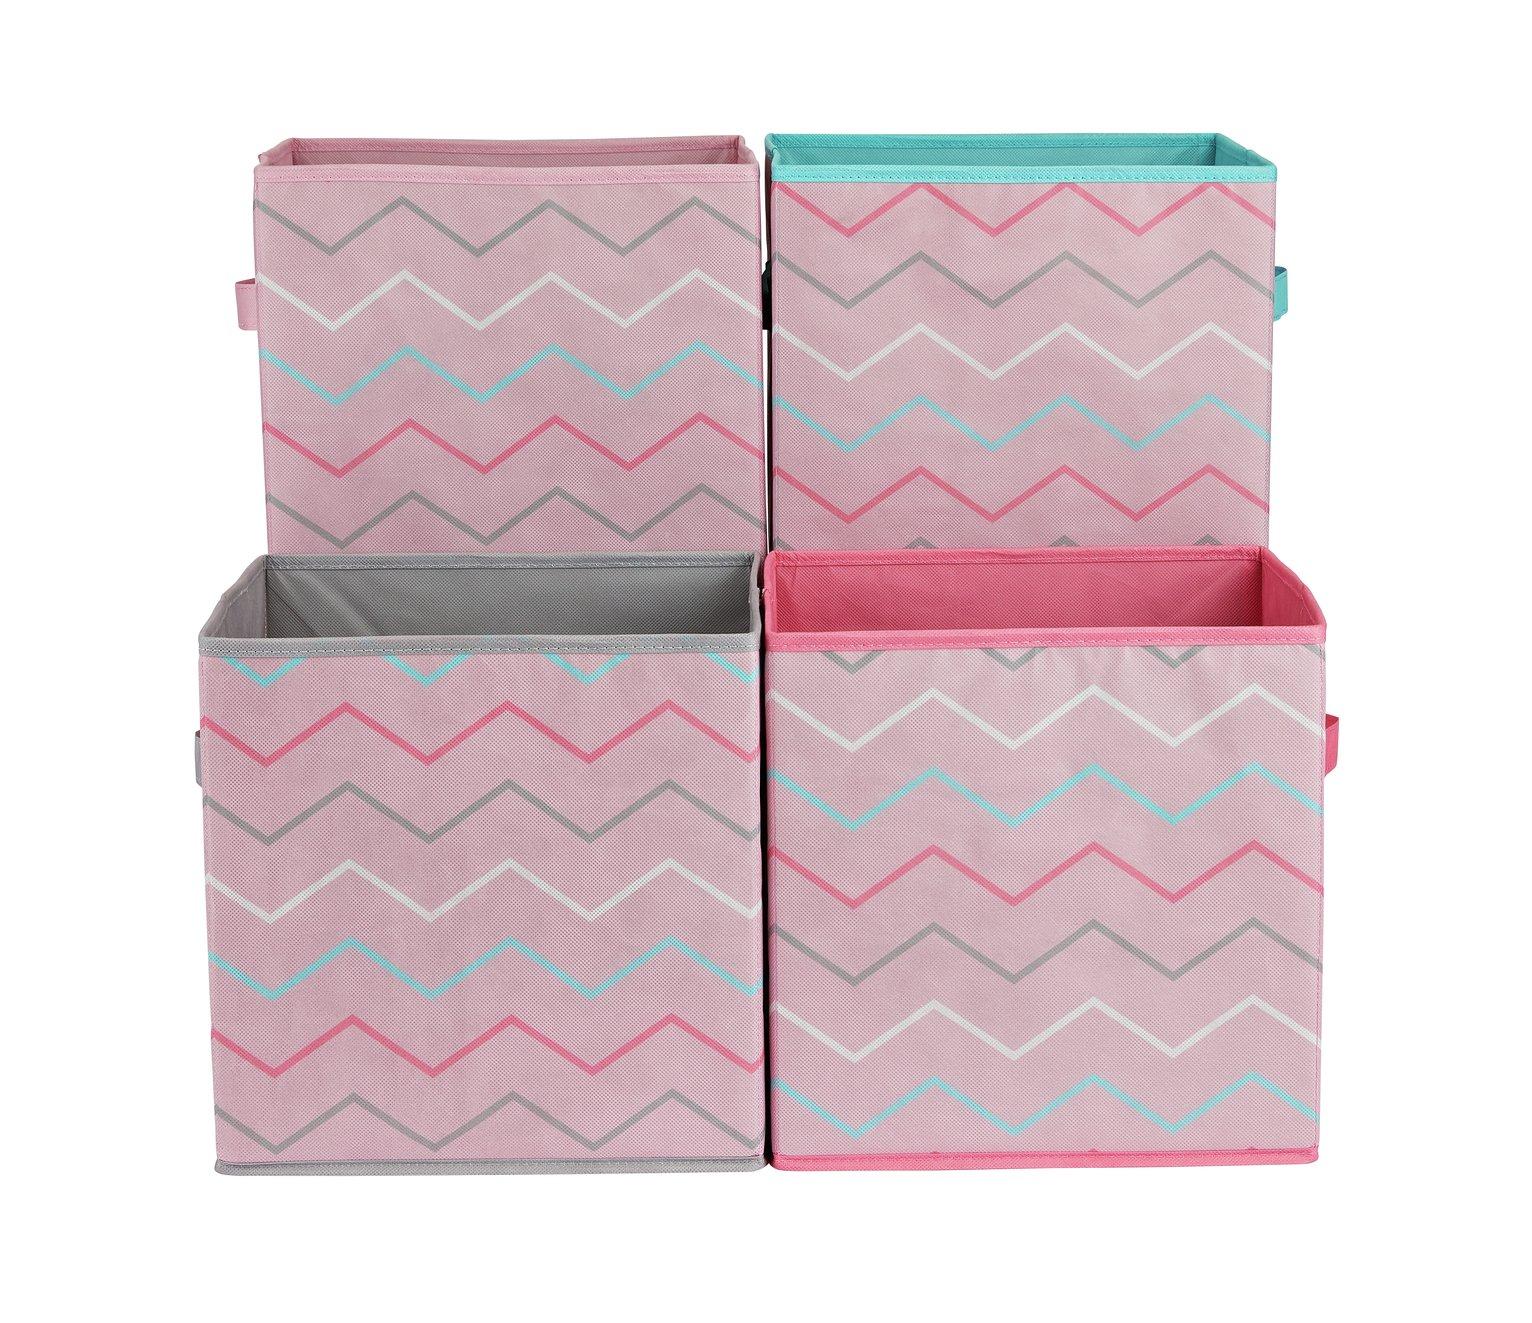 Argos Home Set of 4 Zig-Zag Canvas Boxes